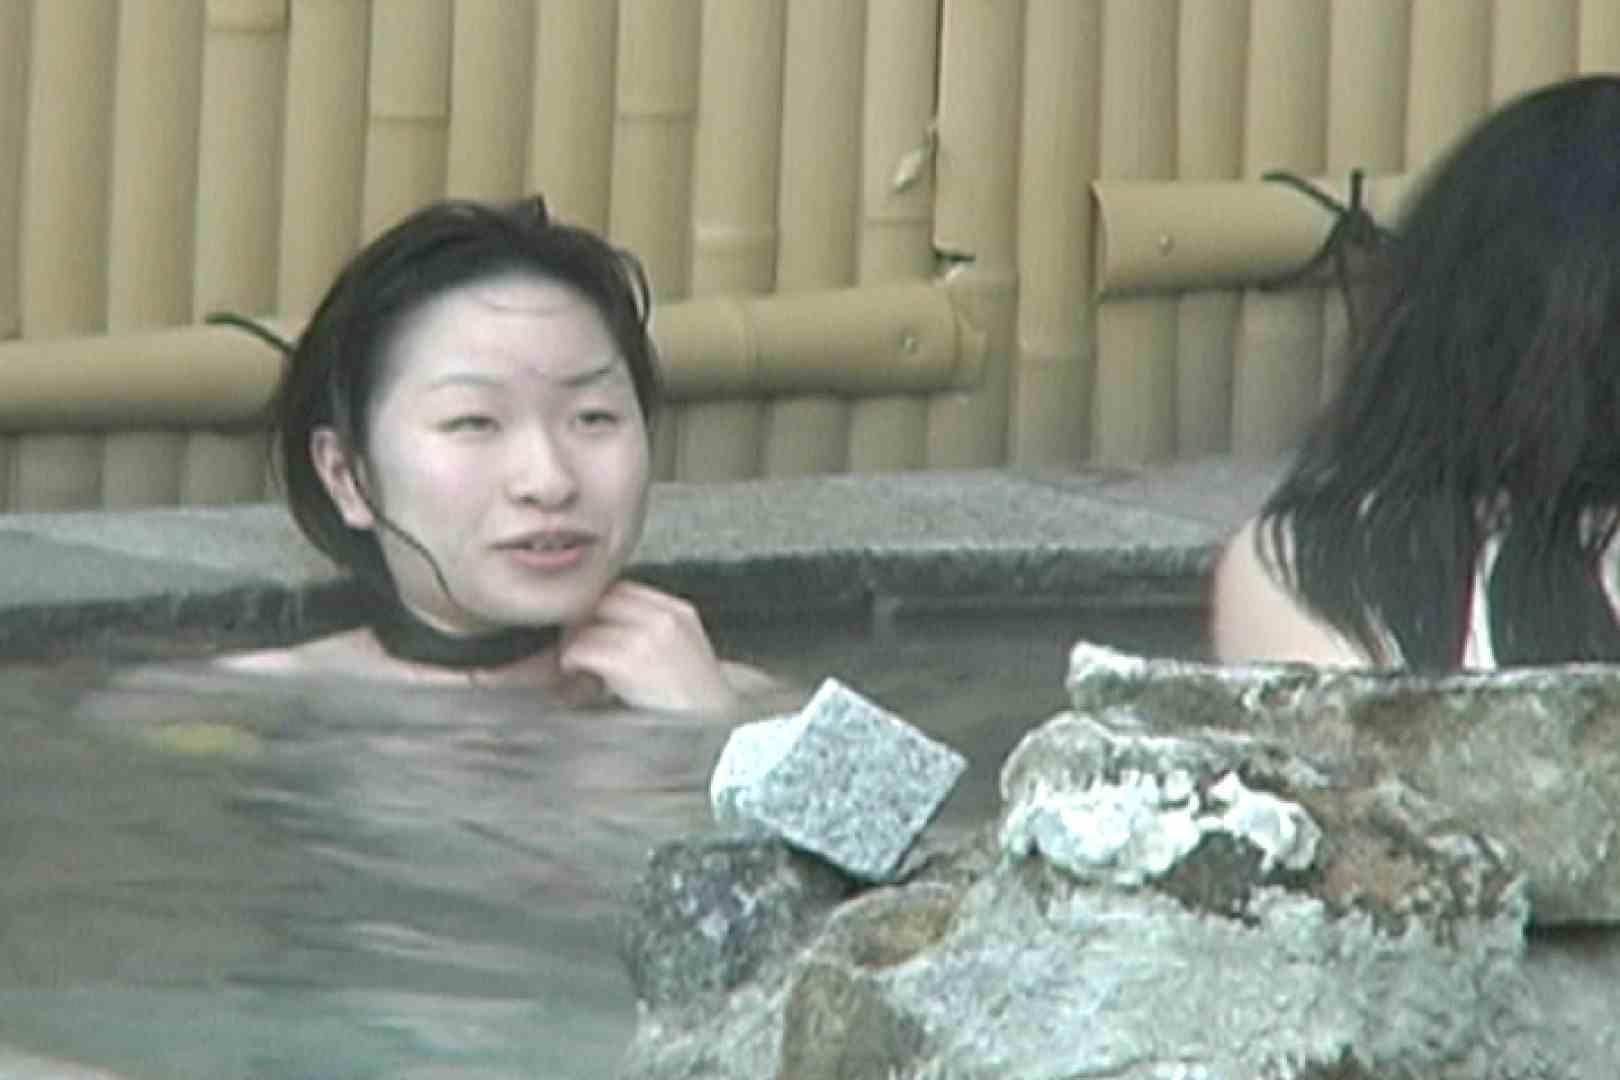 Aquaな露天風呂Vol.595 HなOL | 露天  65pic 58